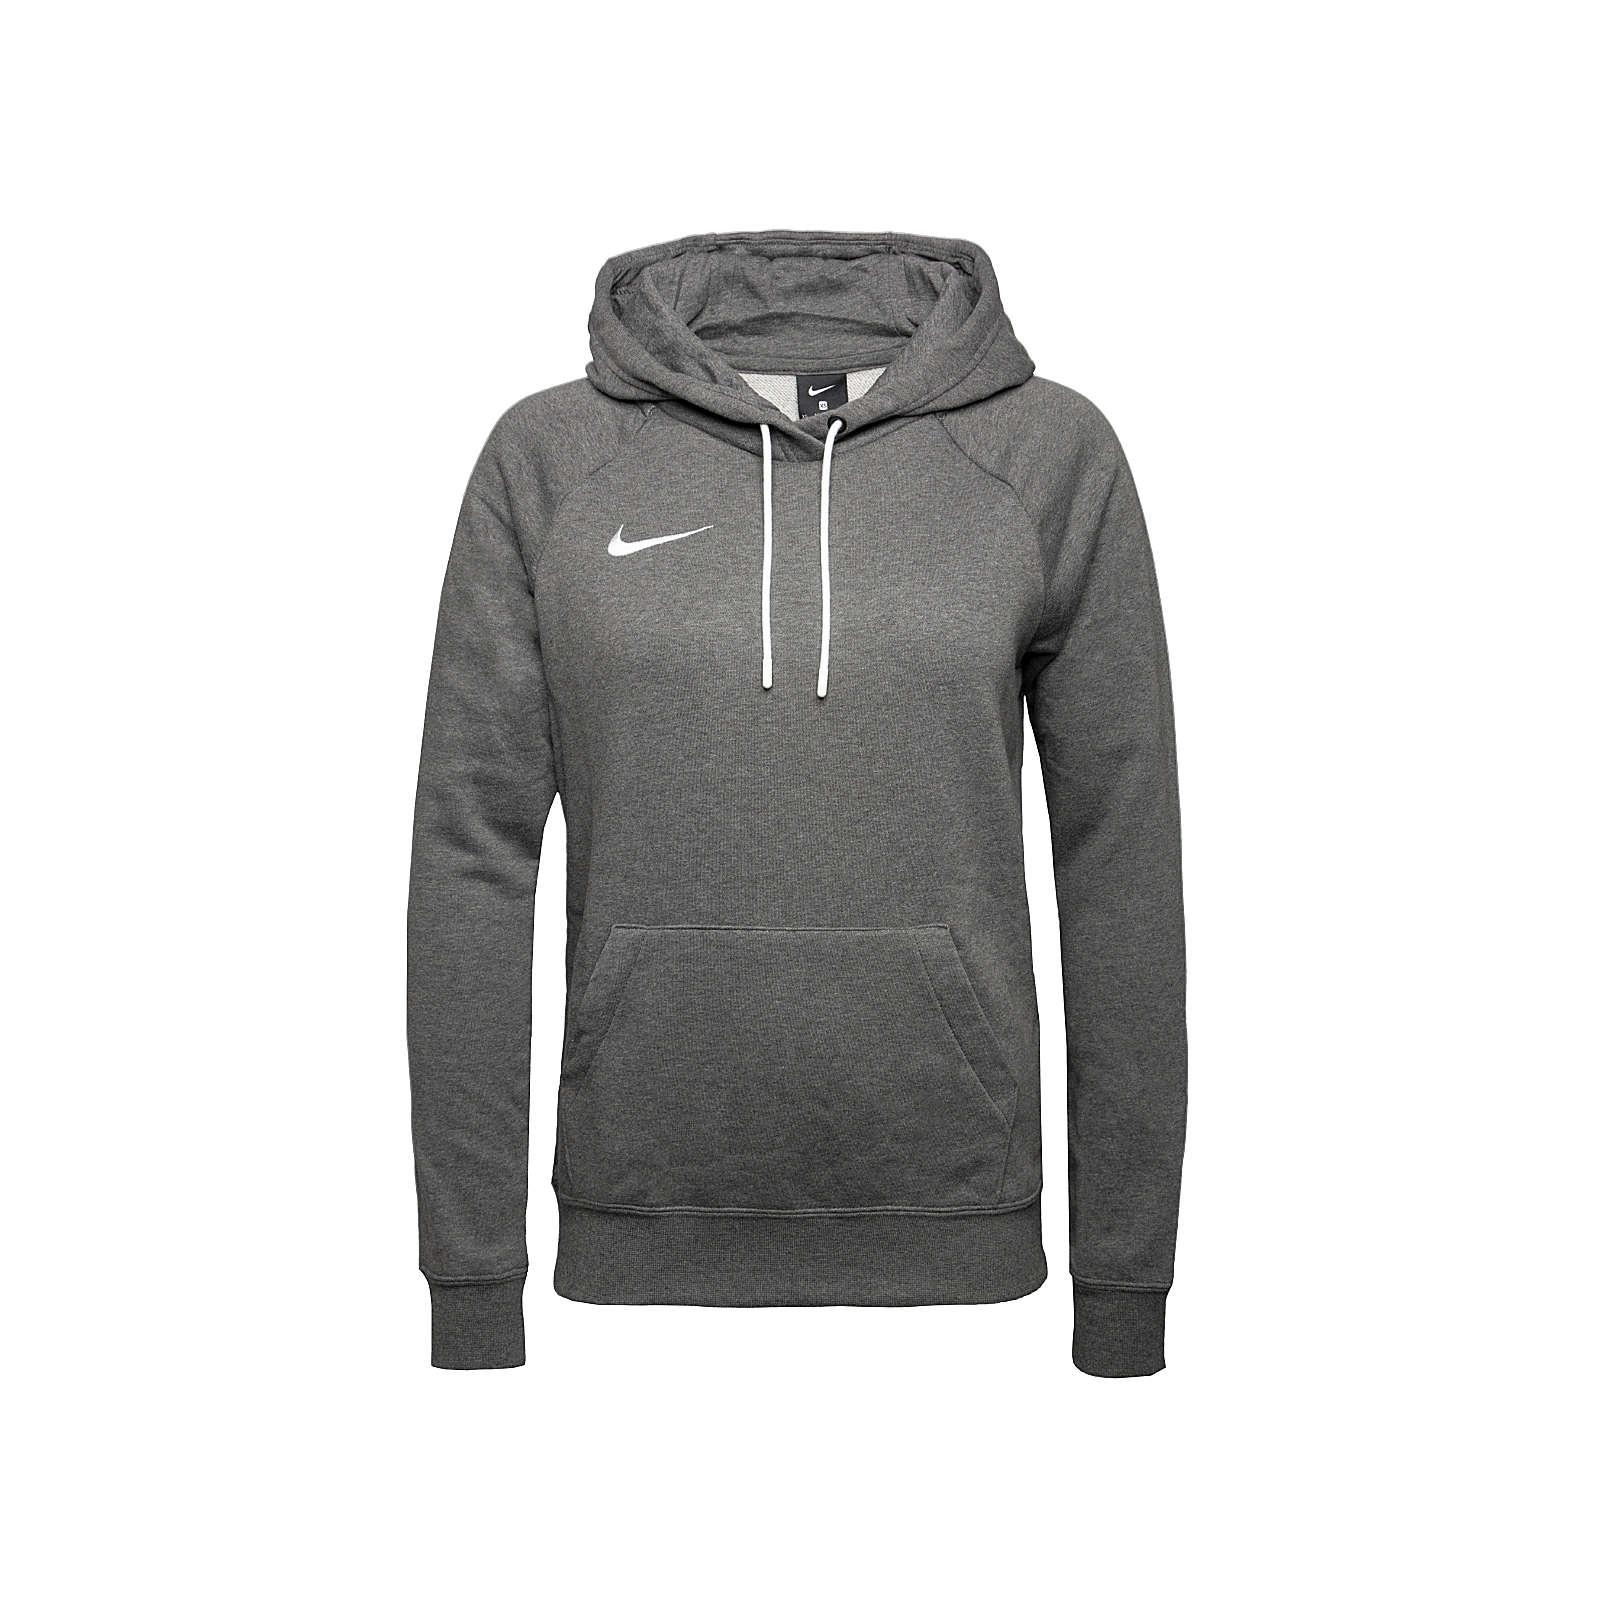 Nike Sportswear Park 20 Fleece Kapuzenpullover Damen Kapuzenpullover grau Damen Gr. 38